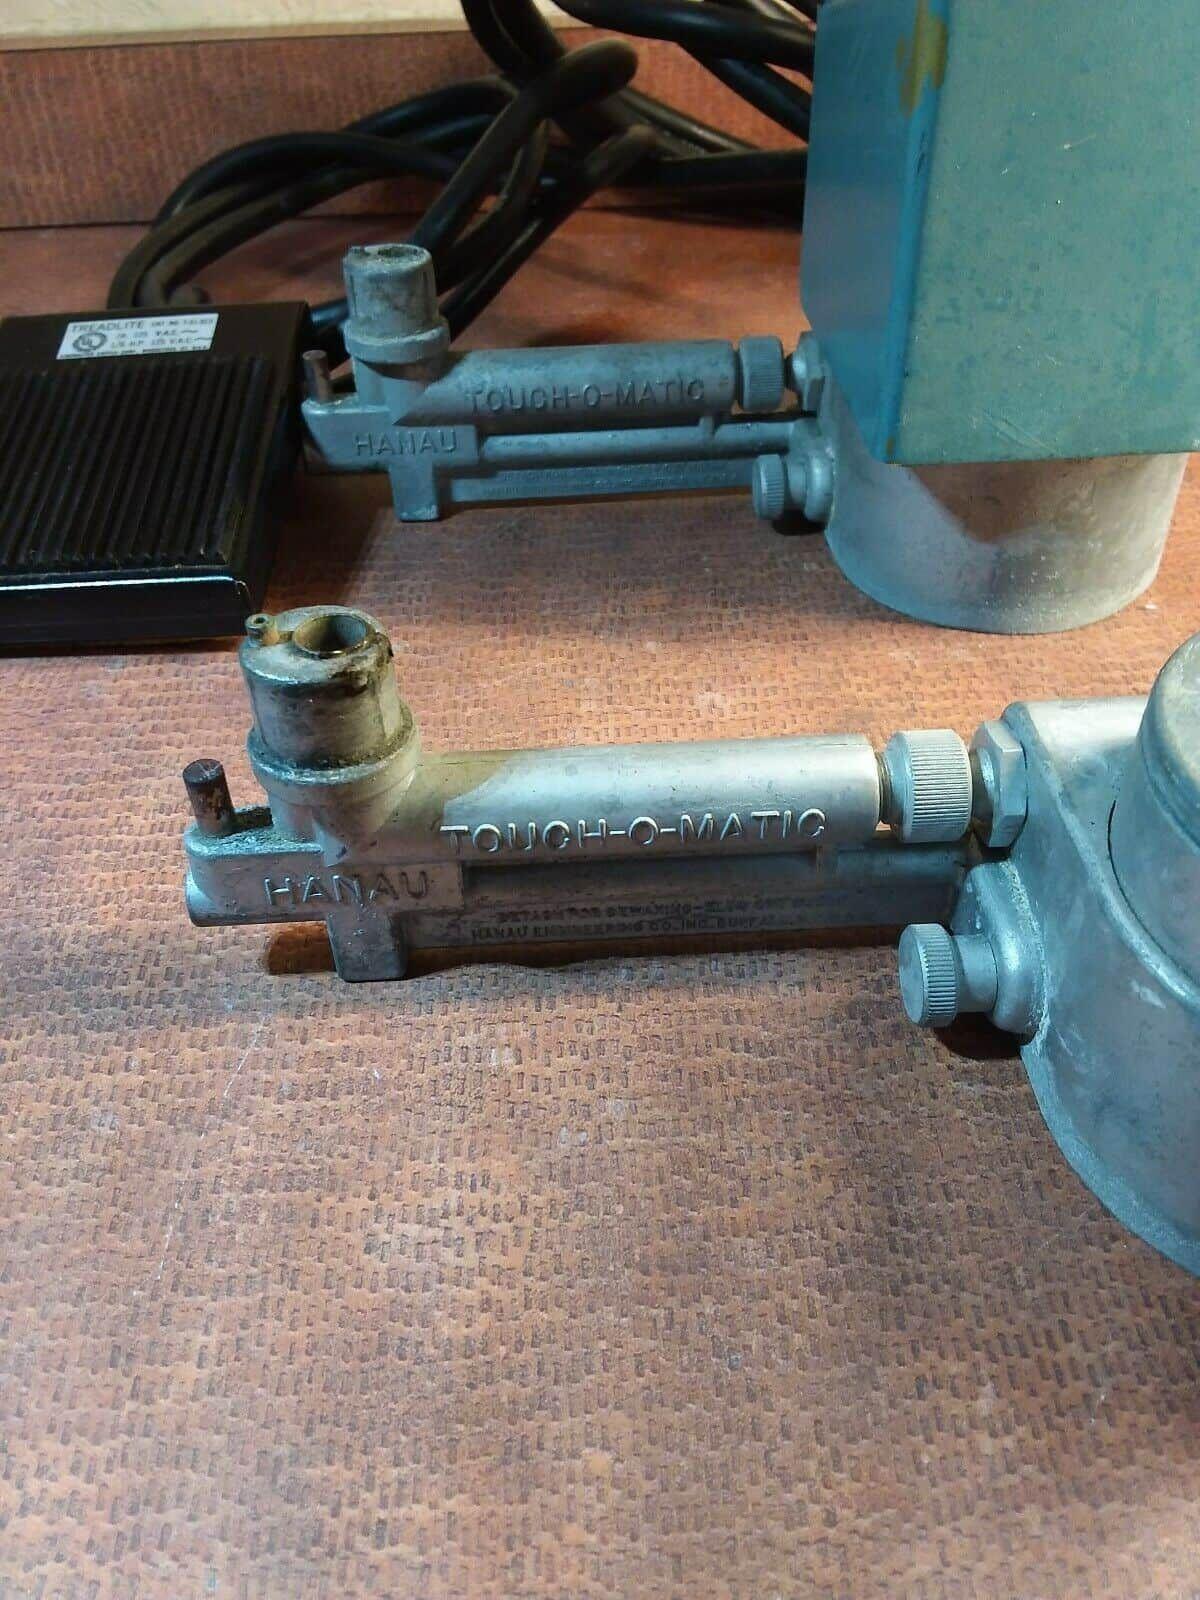 BellCo Treadlite switch w/2 Hanau Touch-O Matic Bunsen Burners